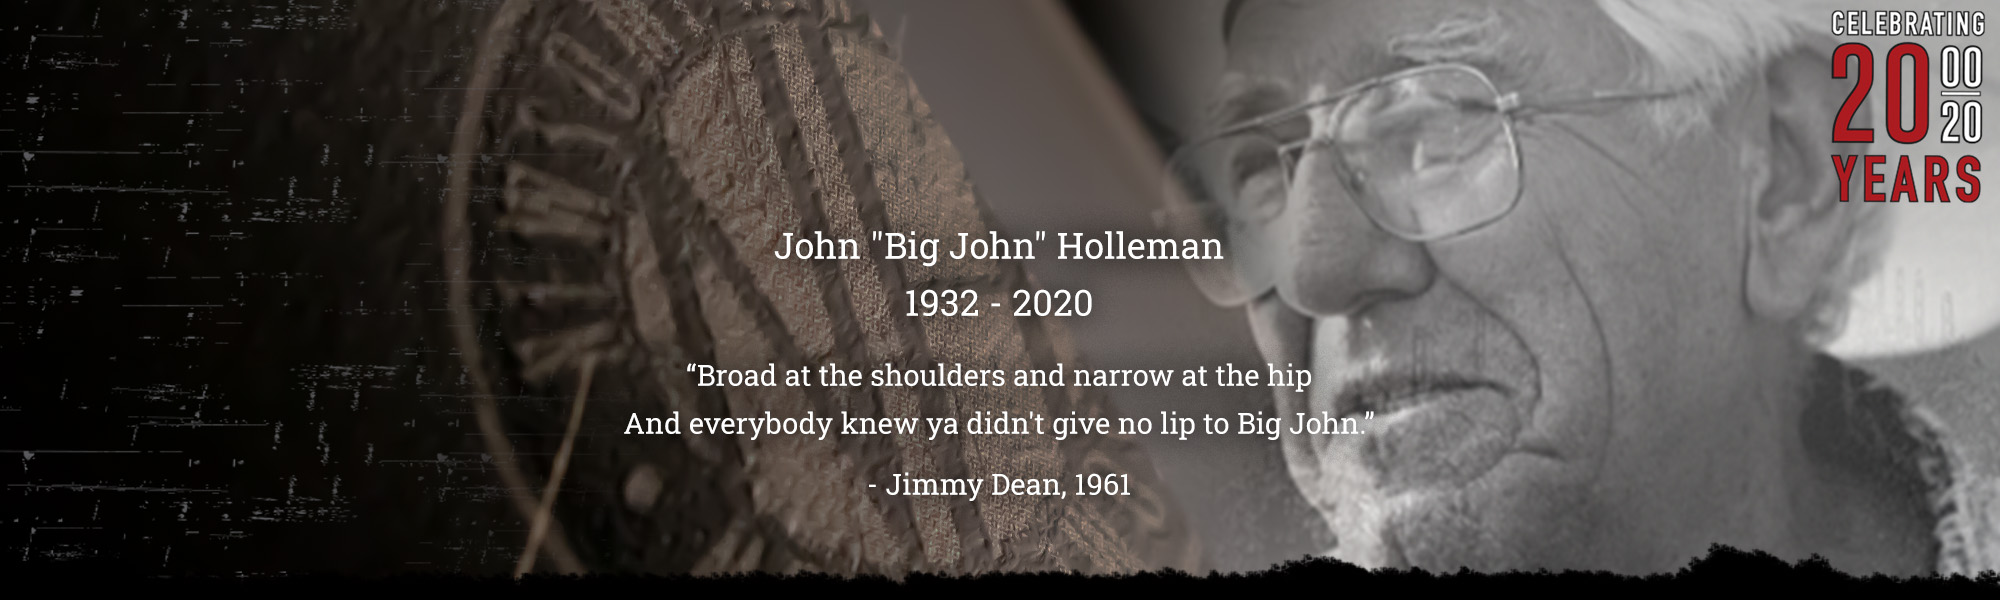 Newsome Harlow Big John